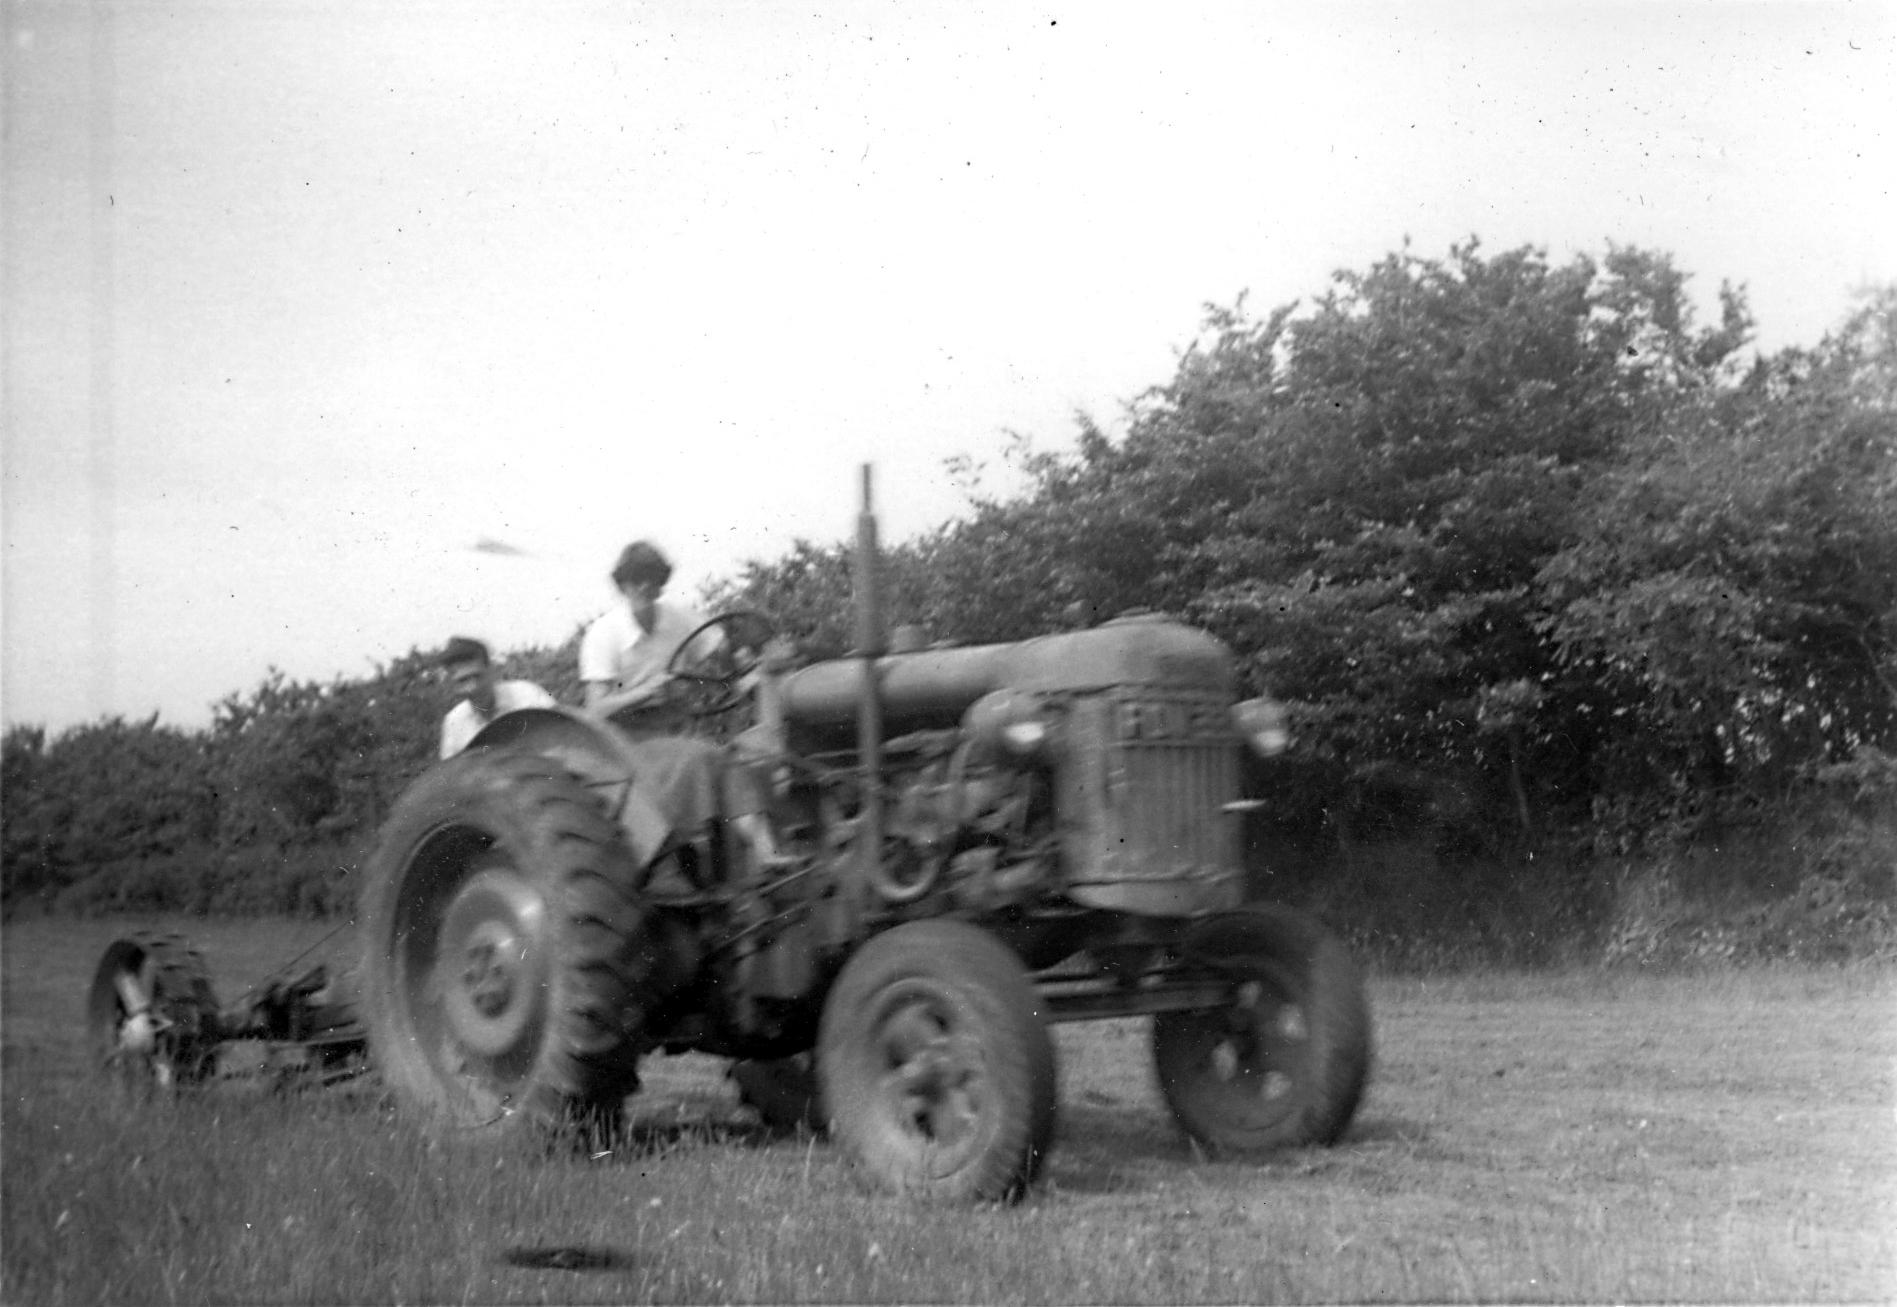 Tractor 1959 -kind permission of Emma Tucker